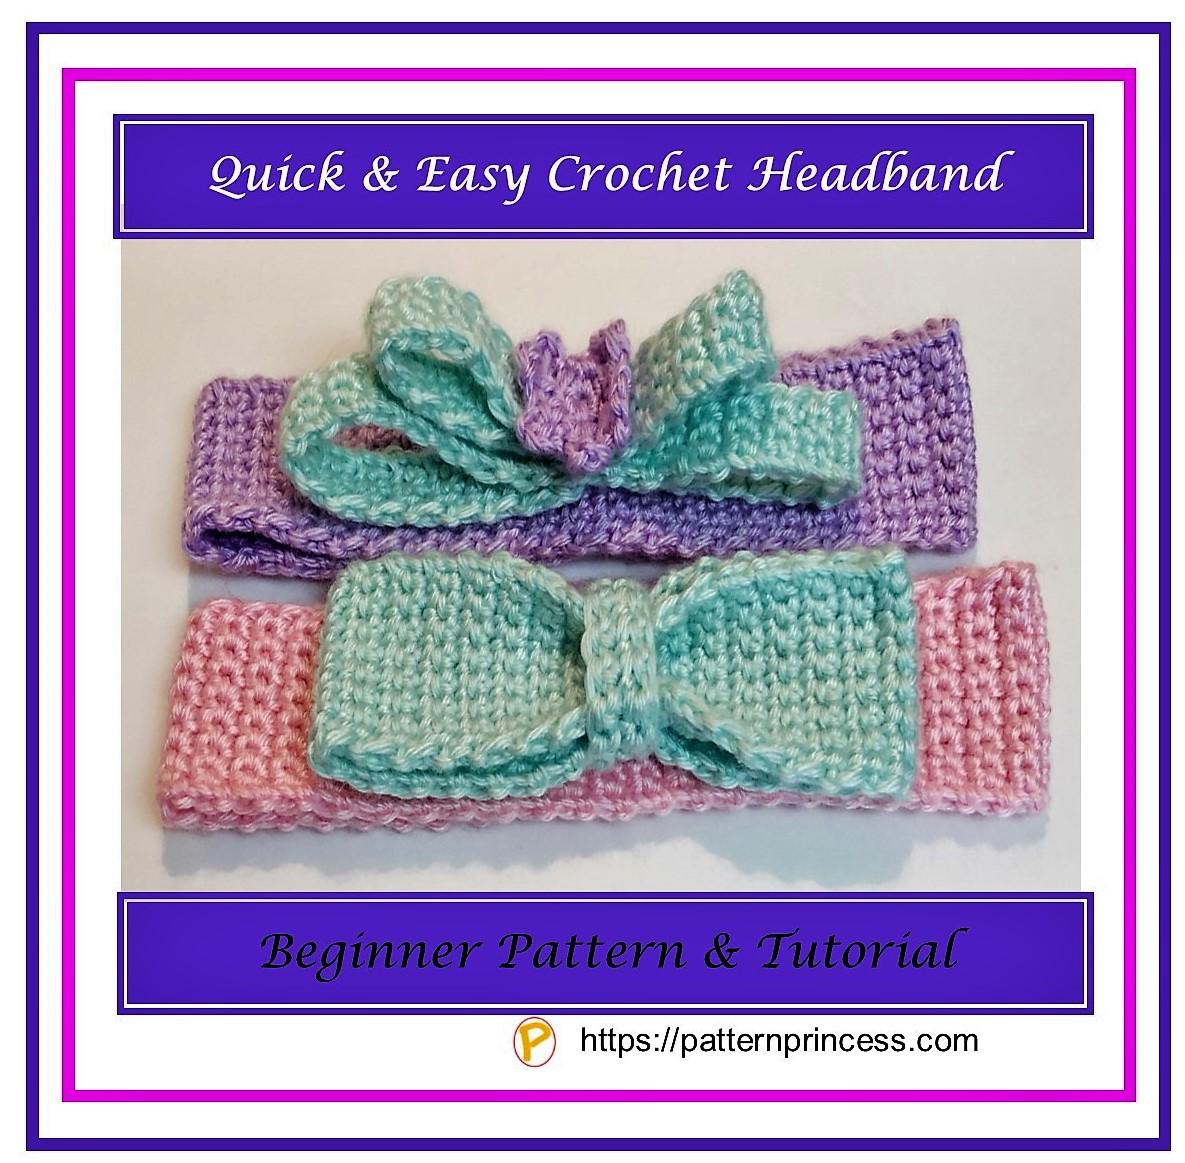 Quick and Easy Crochet Headband 1